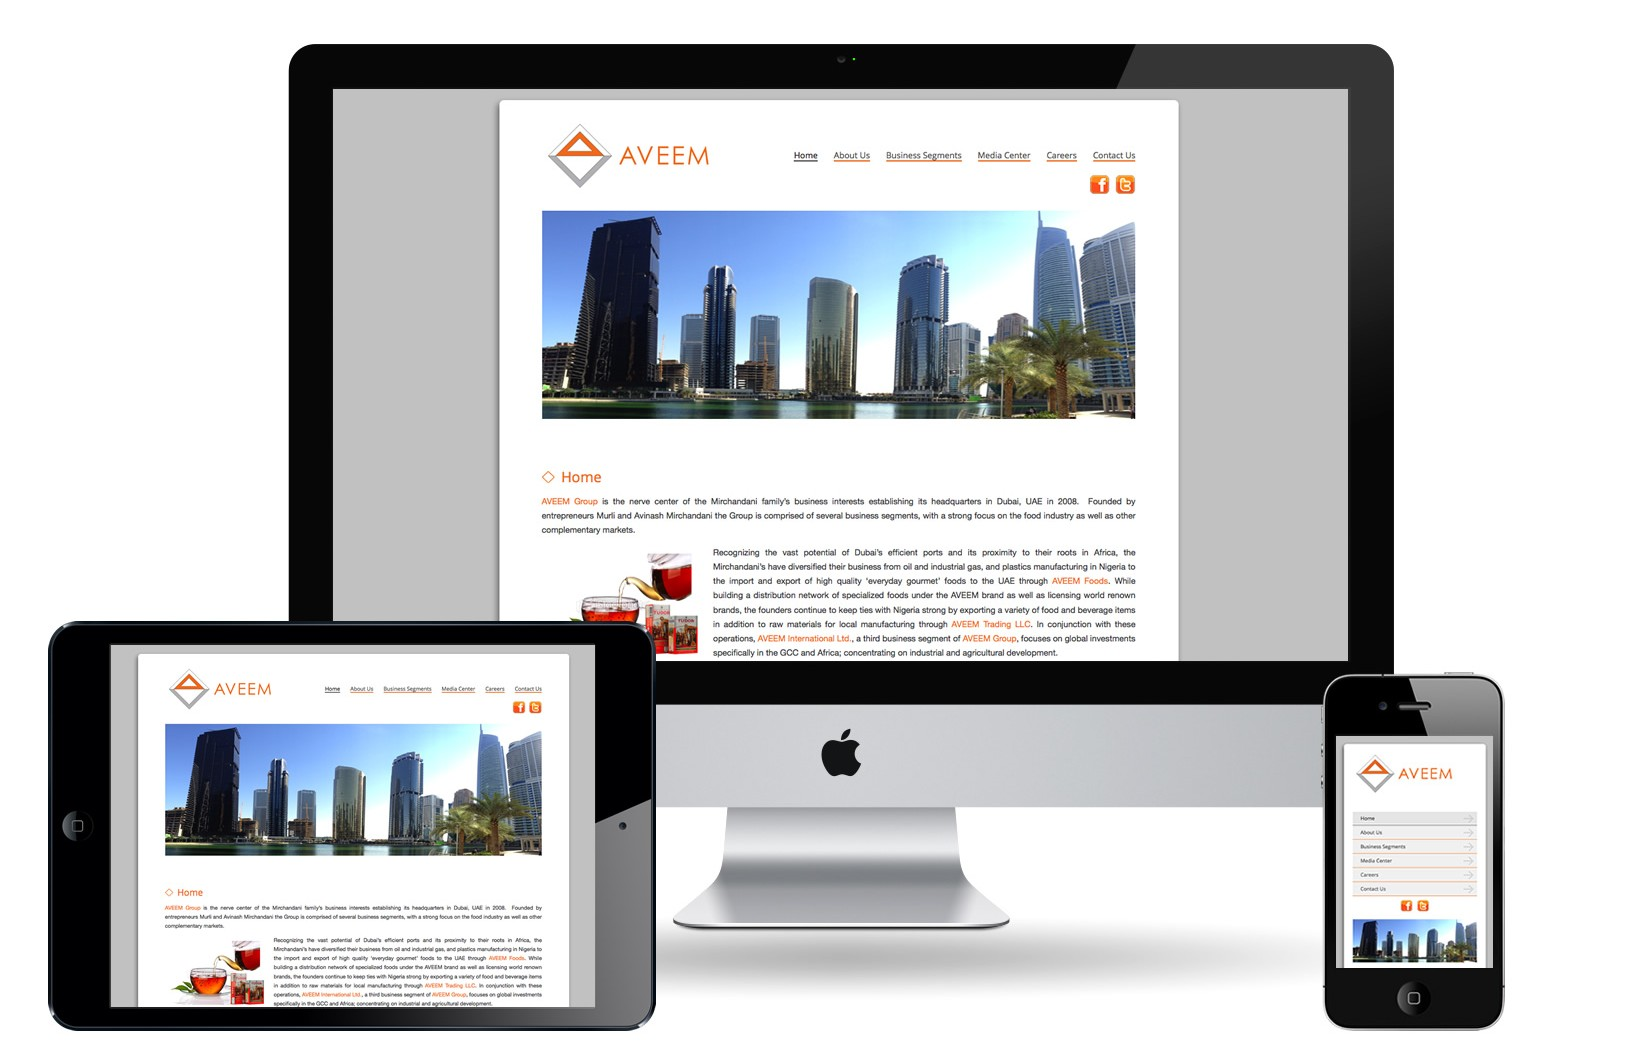 Aveem Responsive e1383594284650 - Fluid Layout Responsive Design